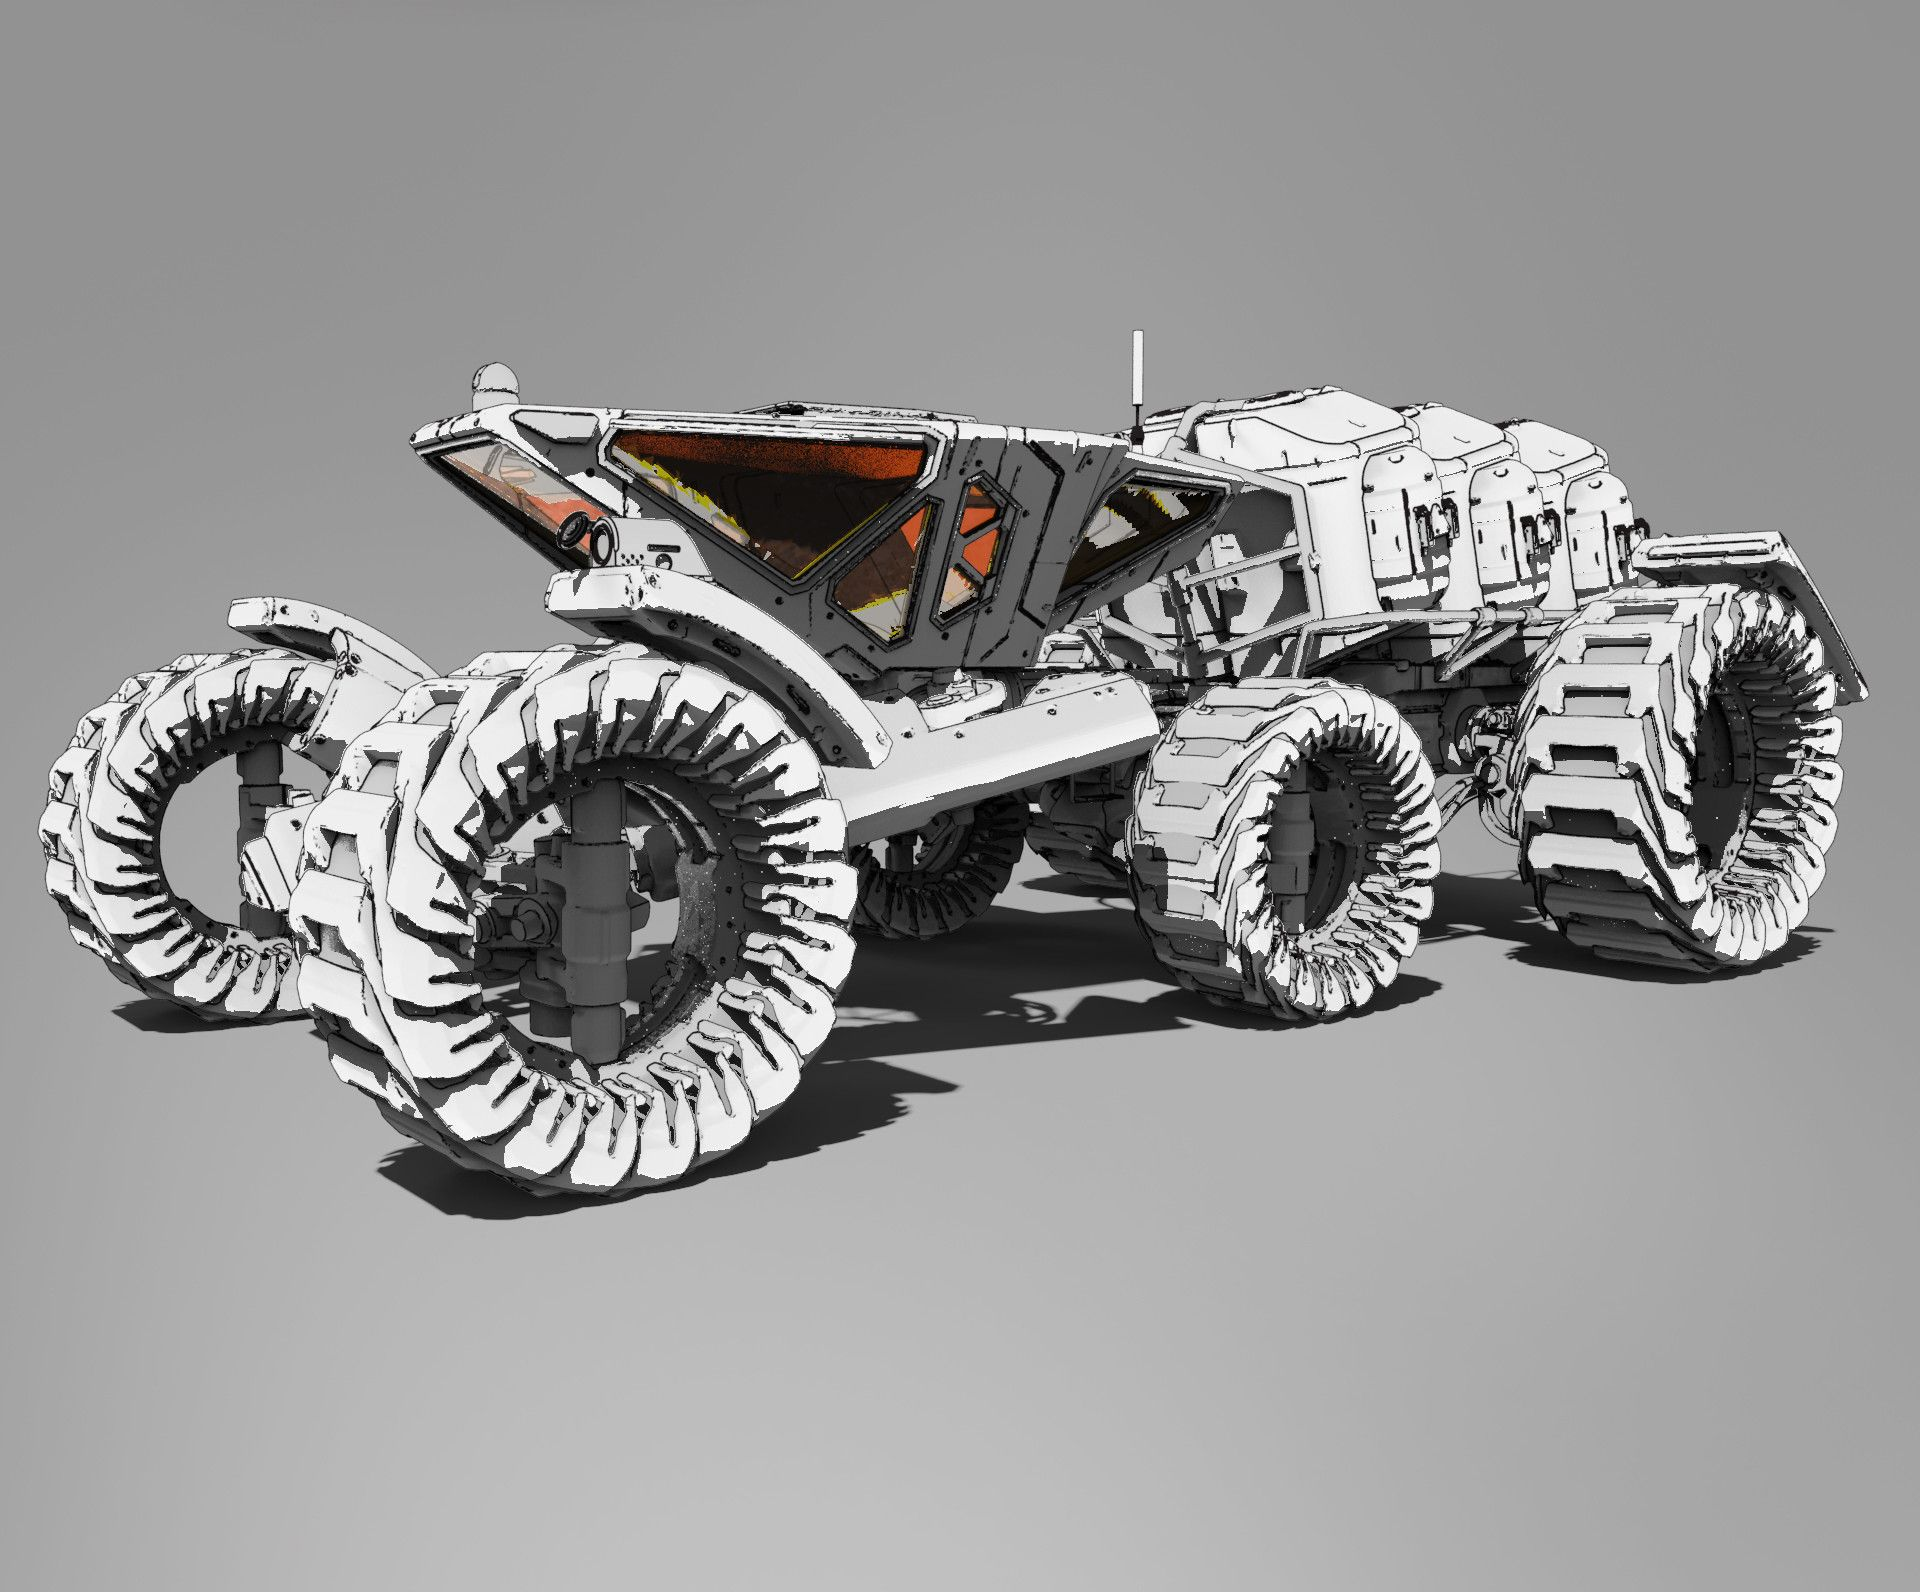 mars exploration rover design - photo #15